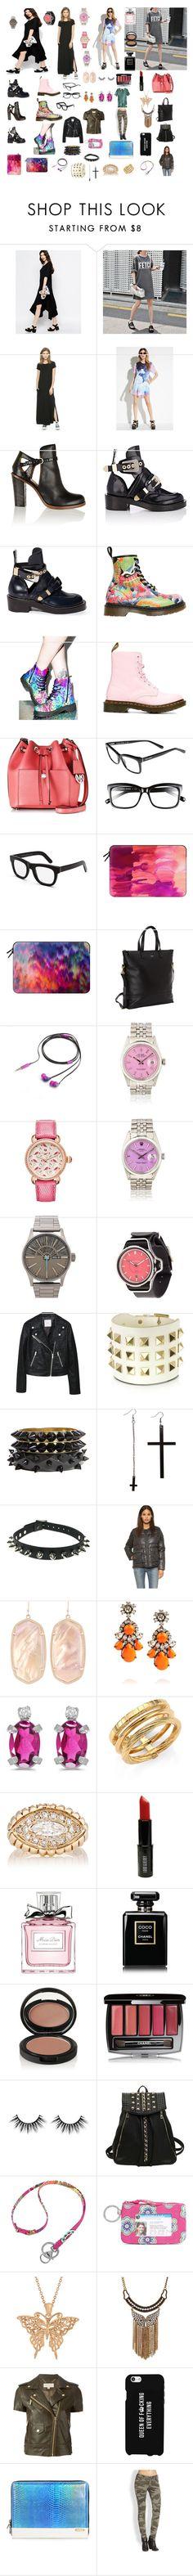 """Market day... Día en el mercado"" by gustavo-adolfo-coto on Polyvore featuring moda, Monki, The Closet, Wilt, Forever 21, MM6 Maison Margiela, Balenciaga, Dr. Martens, T.U.K. y Michael Kors"